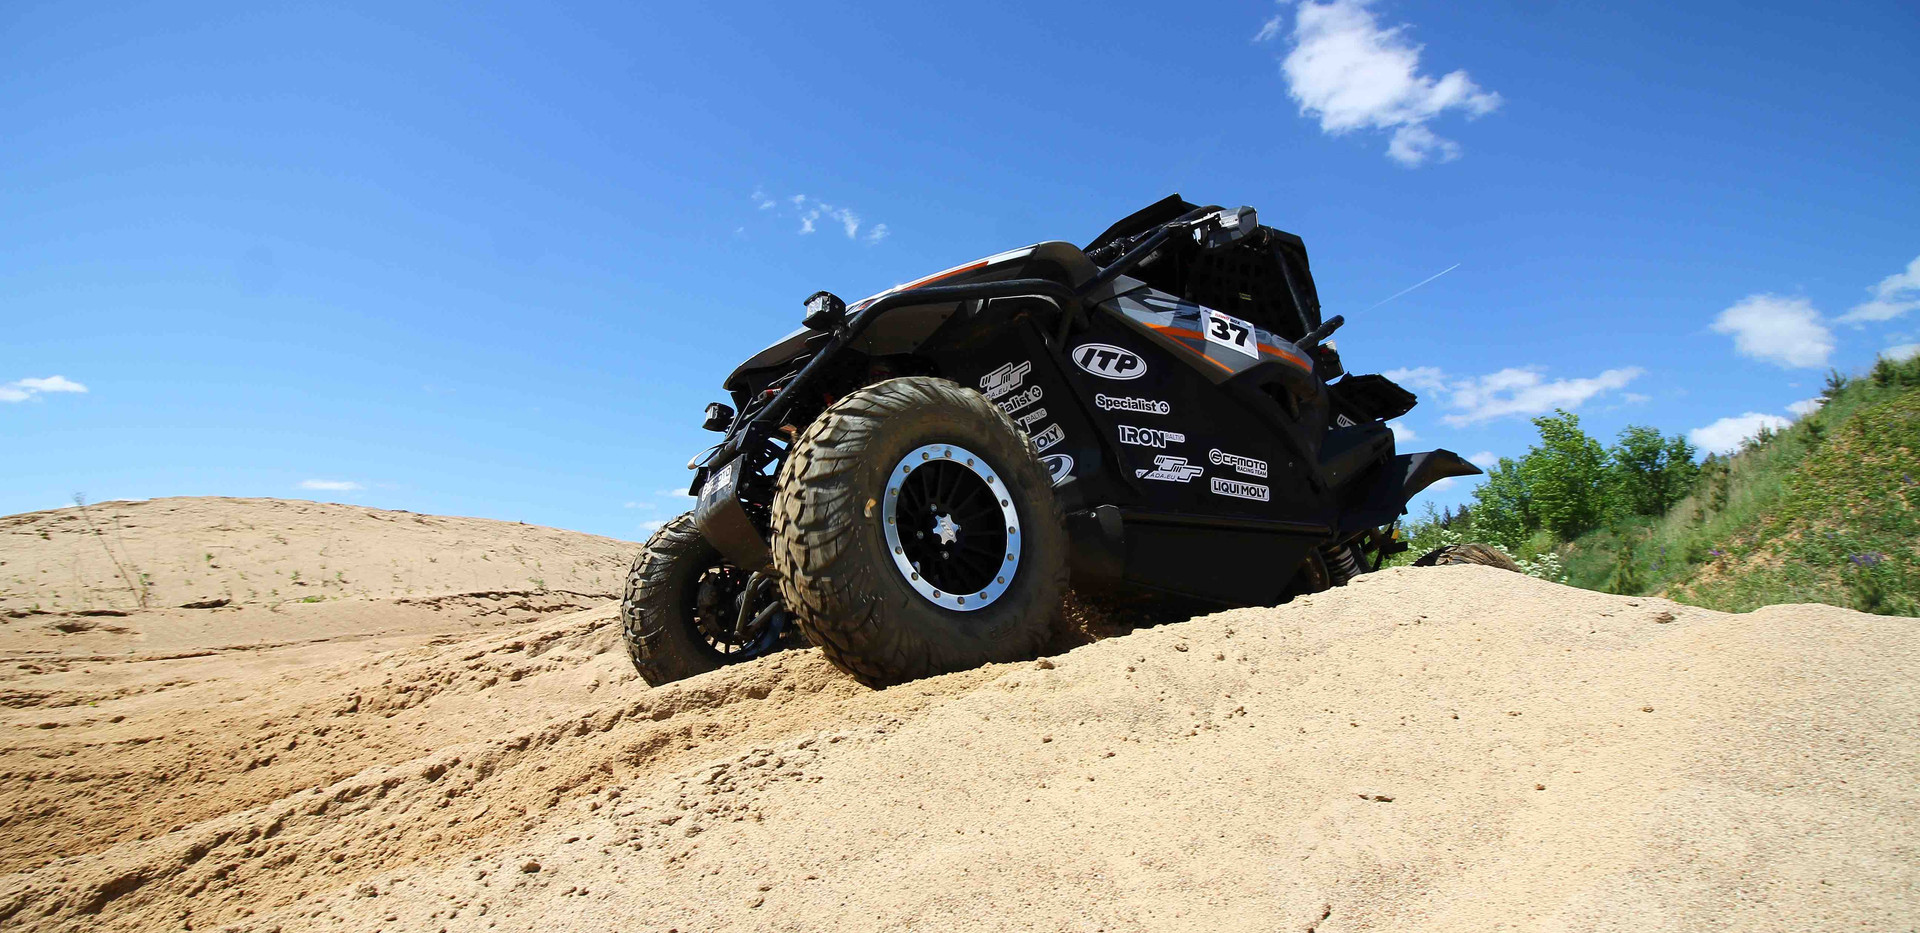 cfmoto racingteam sand box21.jpeg